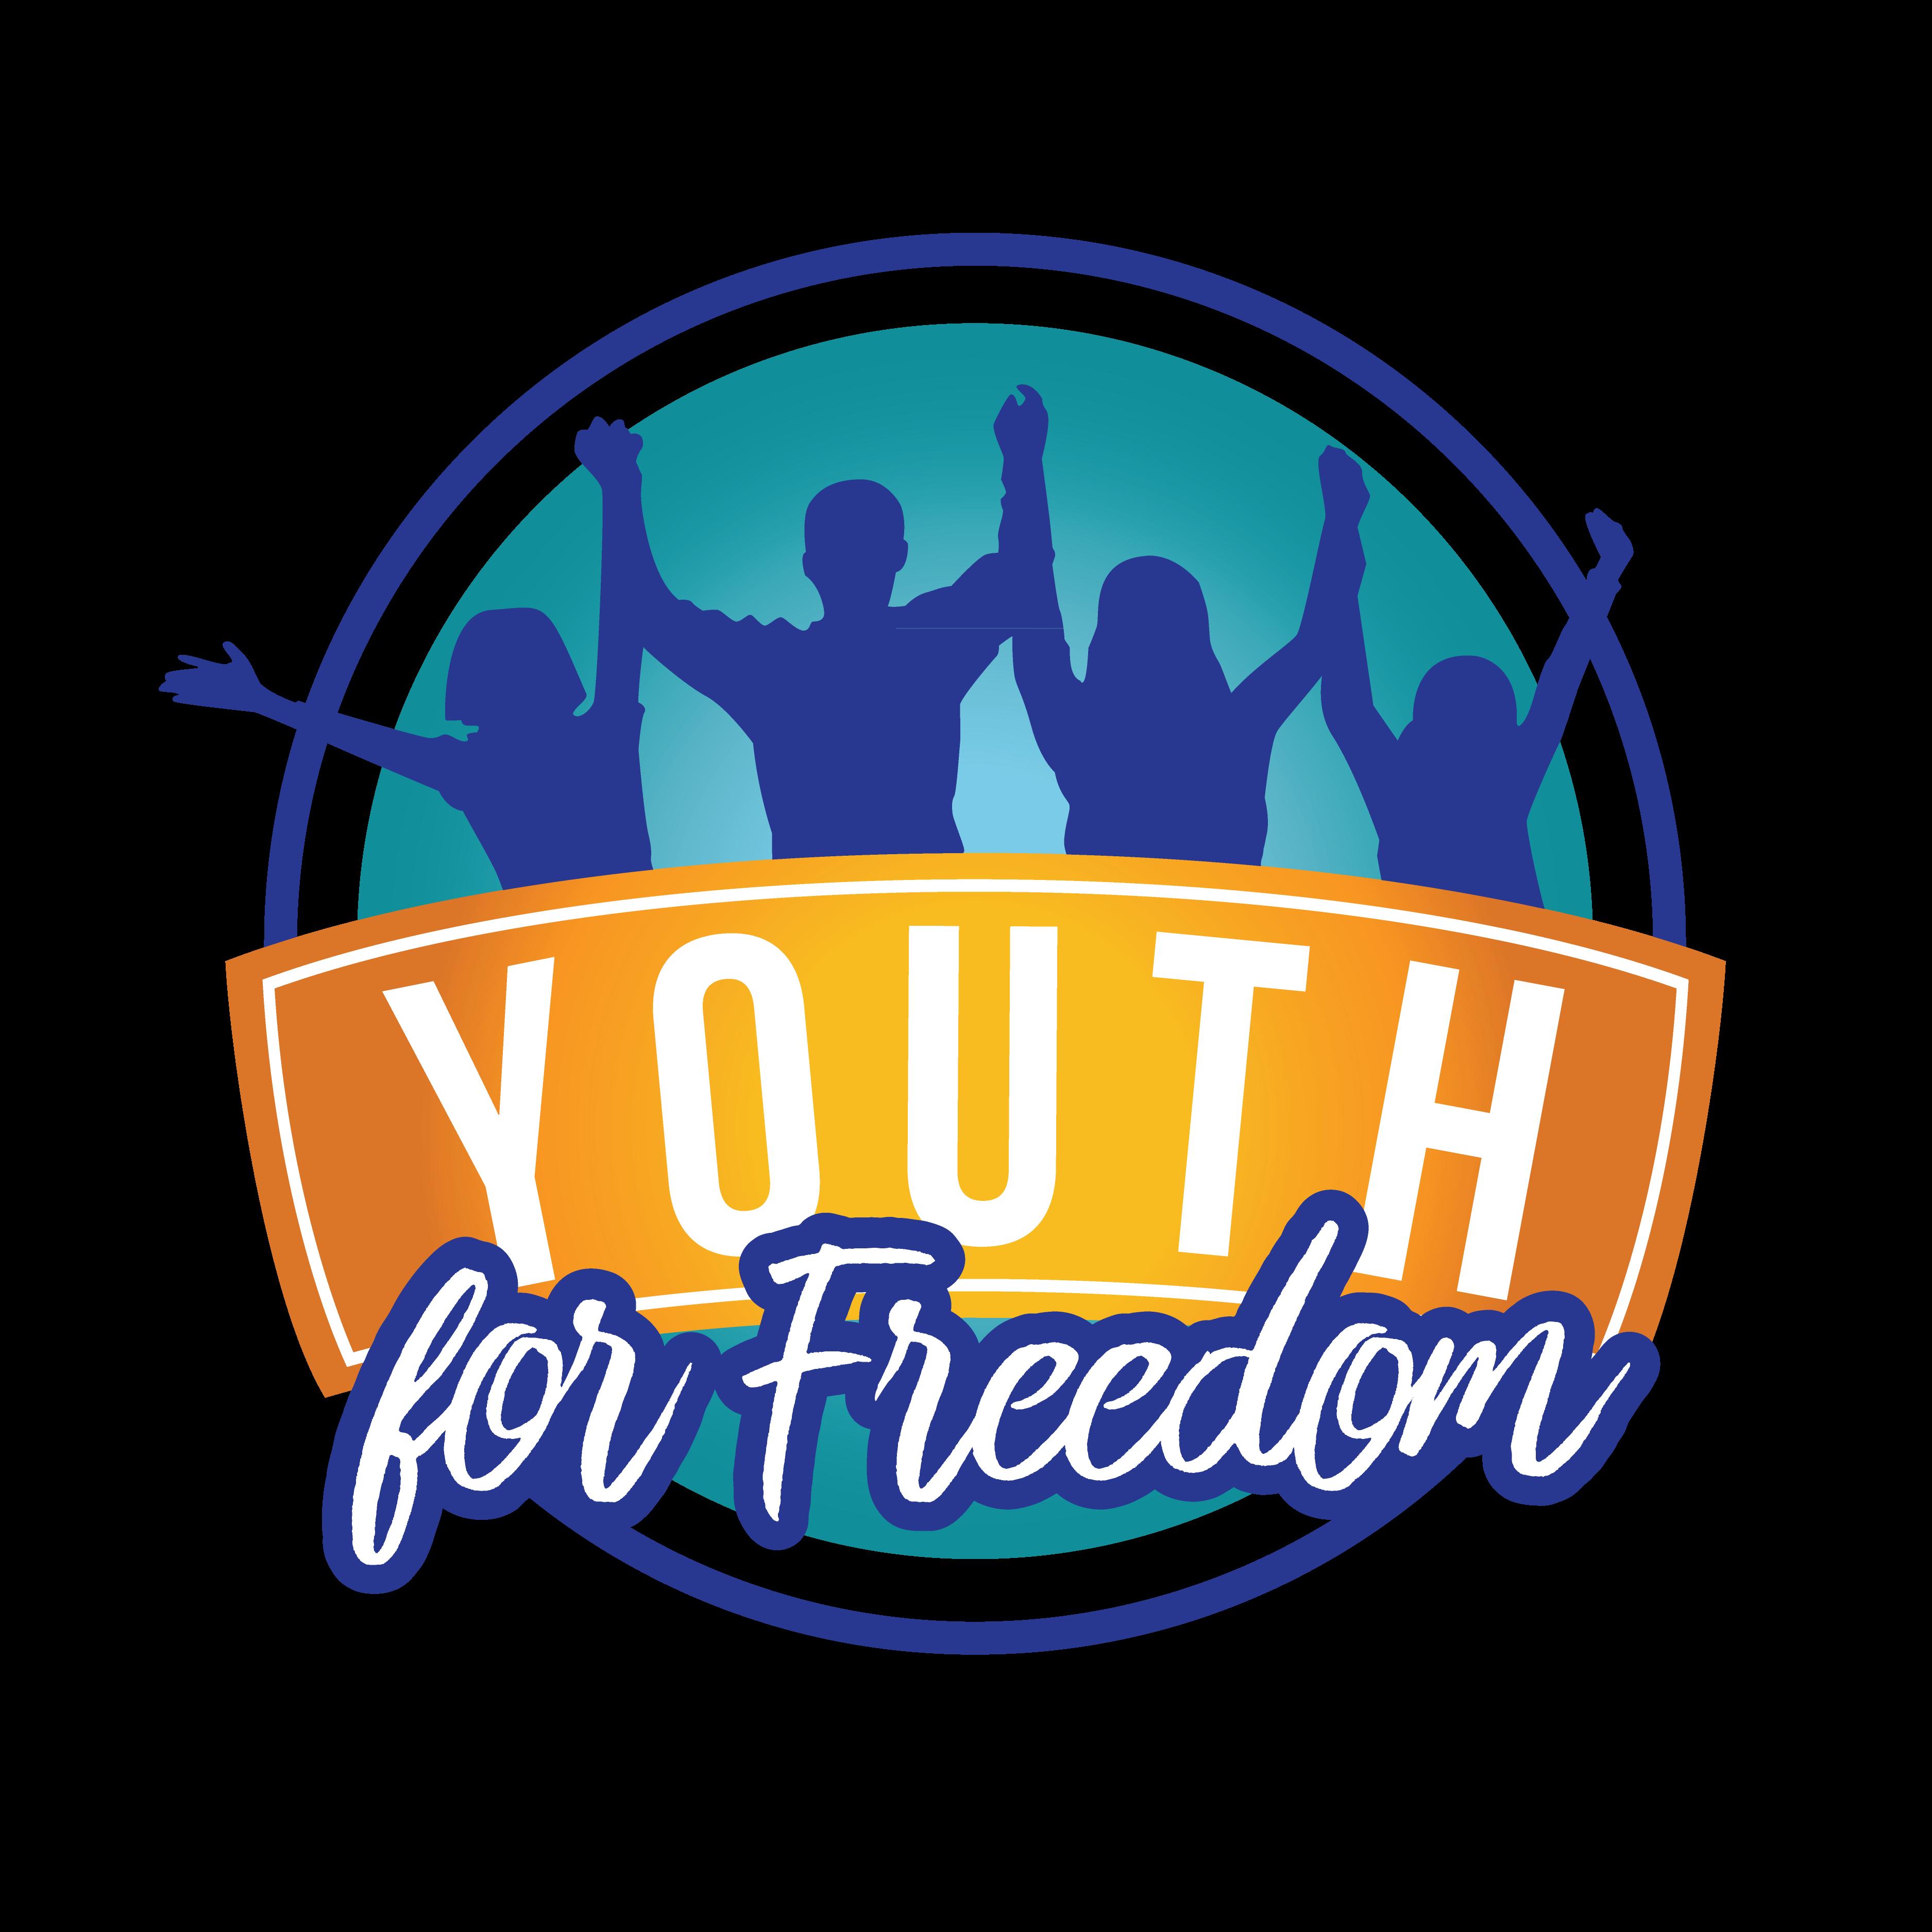 Youth For Freedom Youth For Freedom Freedom Youth School Logos